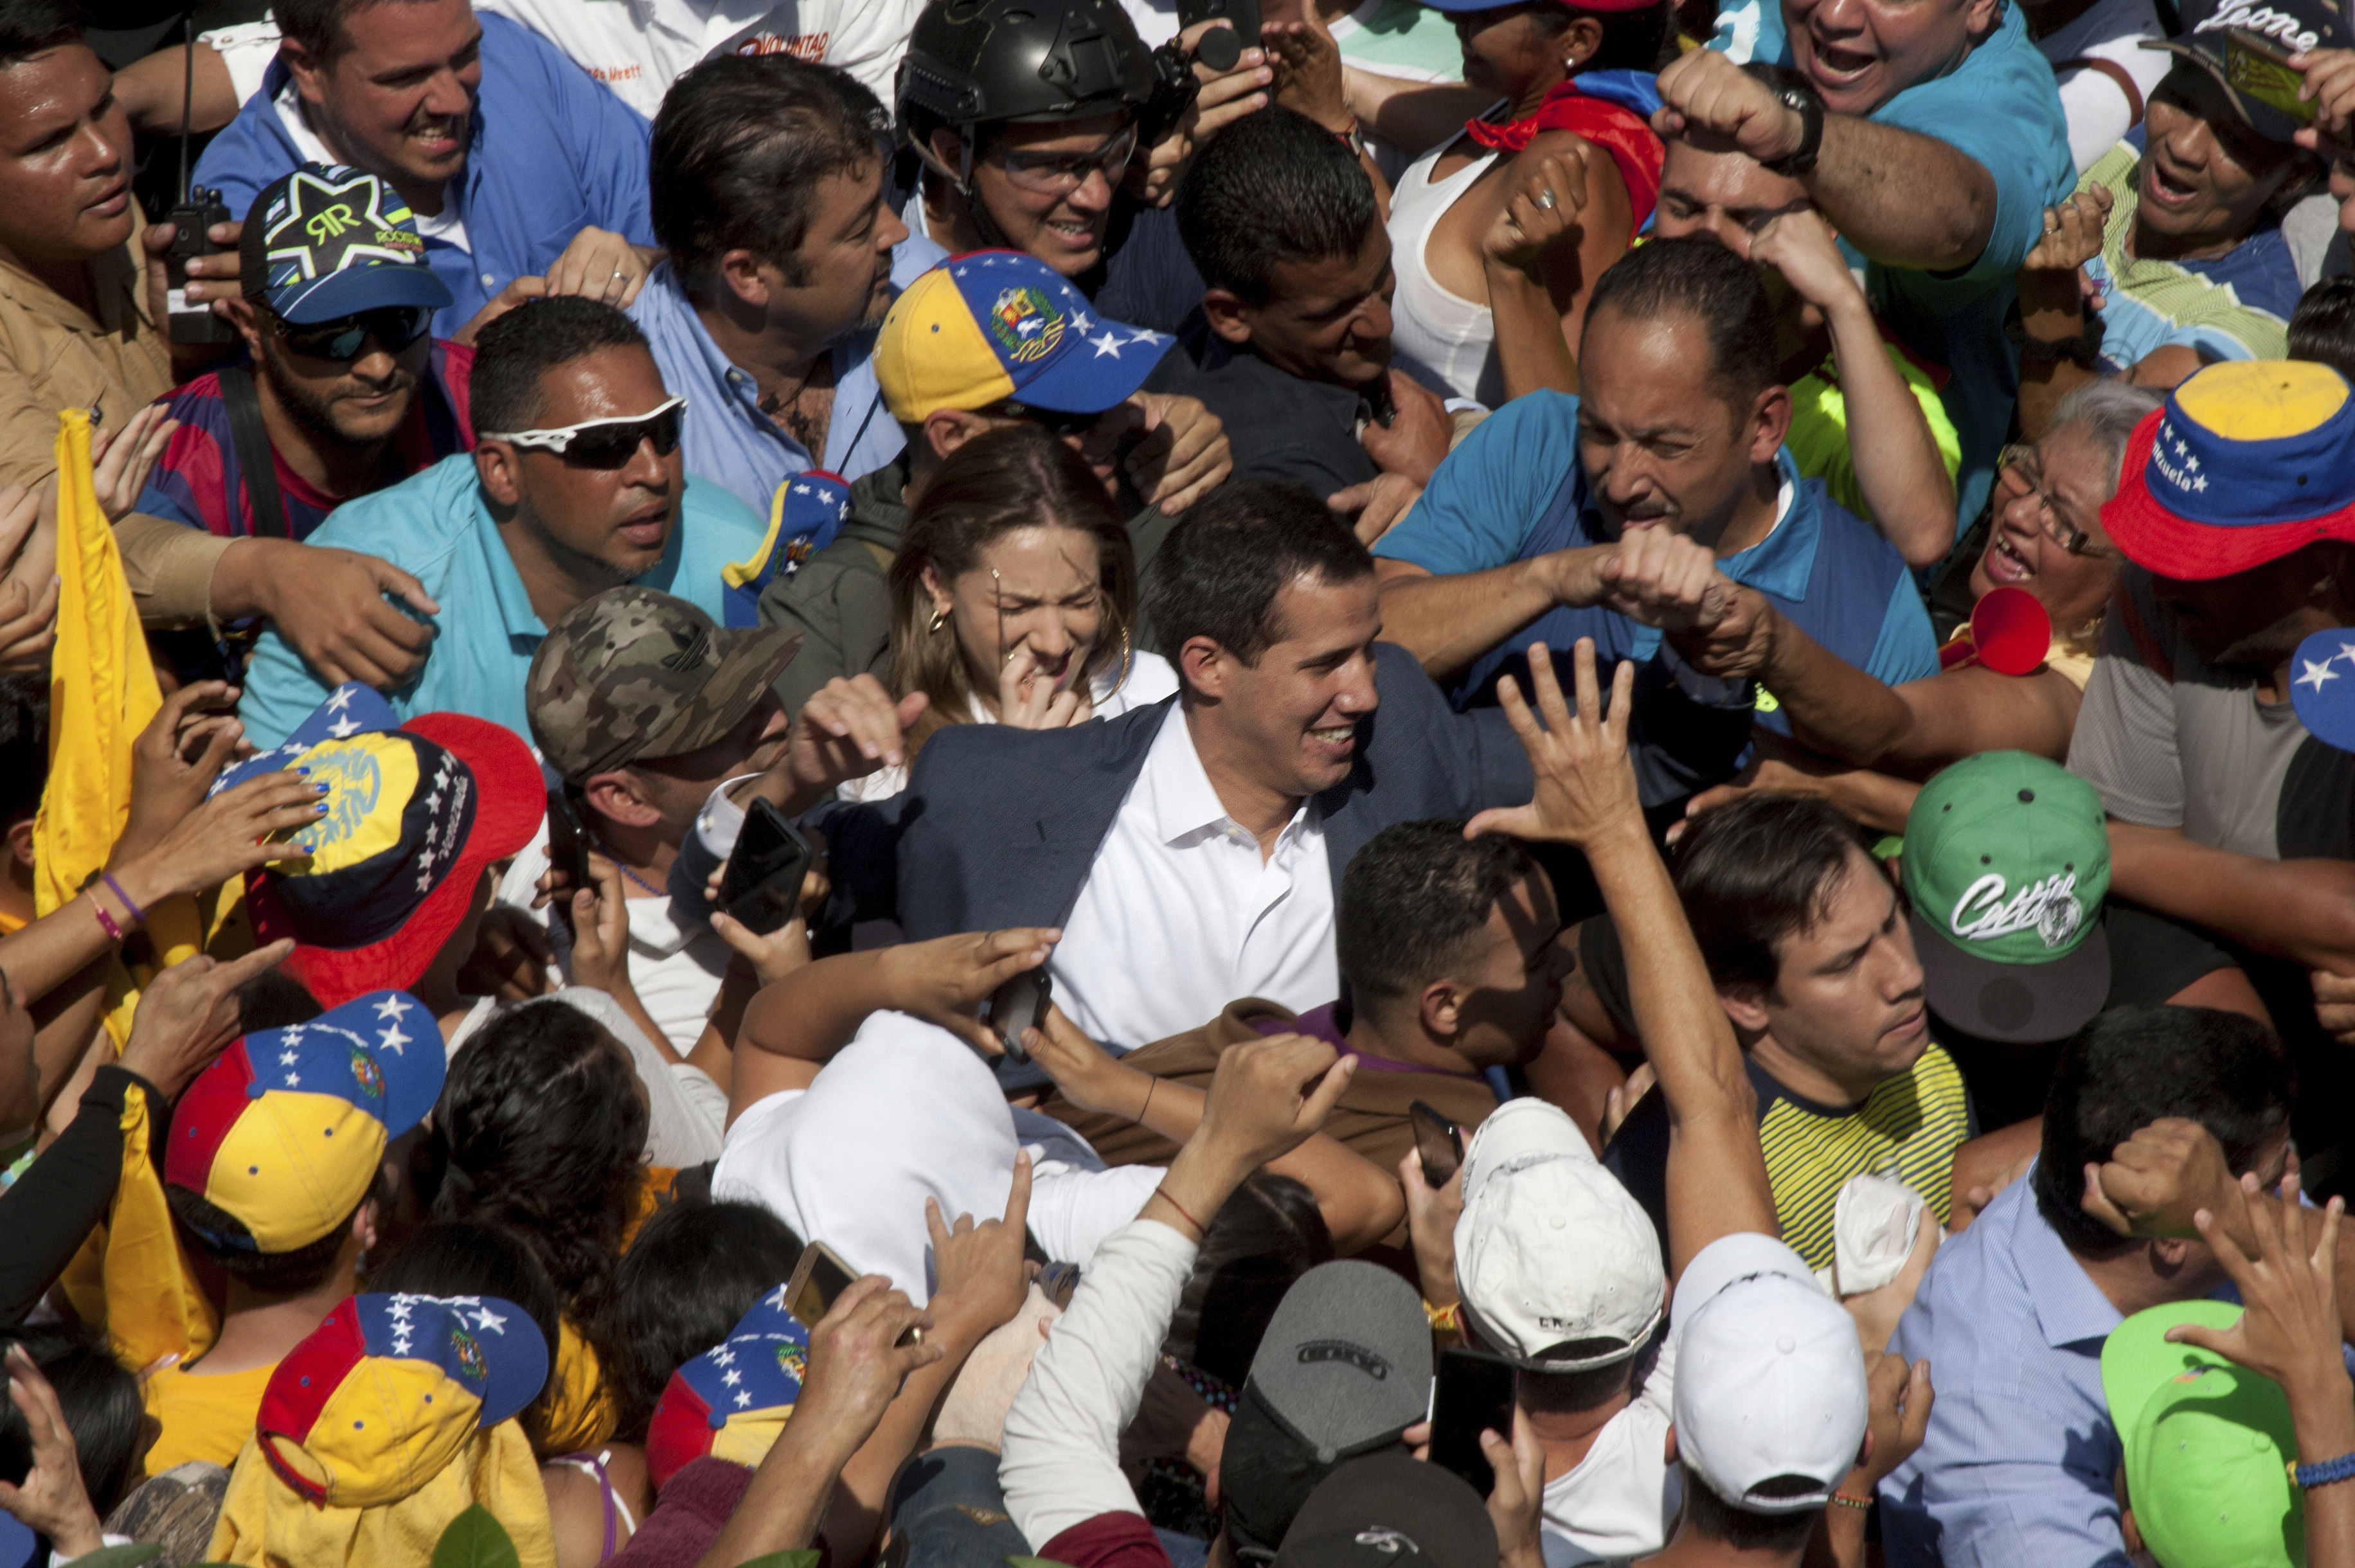 Venezuelan opposition leader Juan Guaido, center